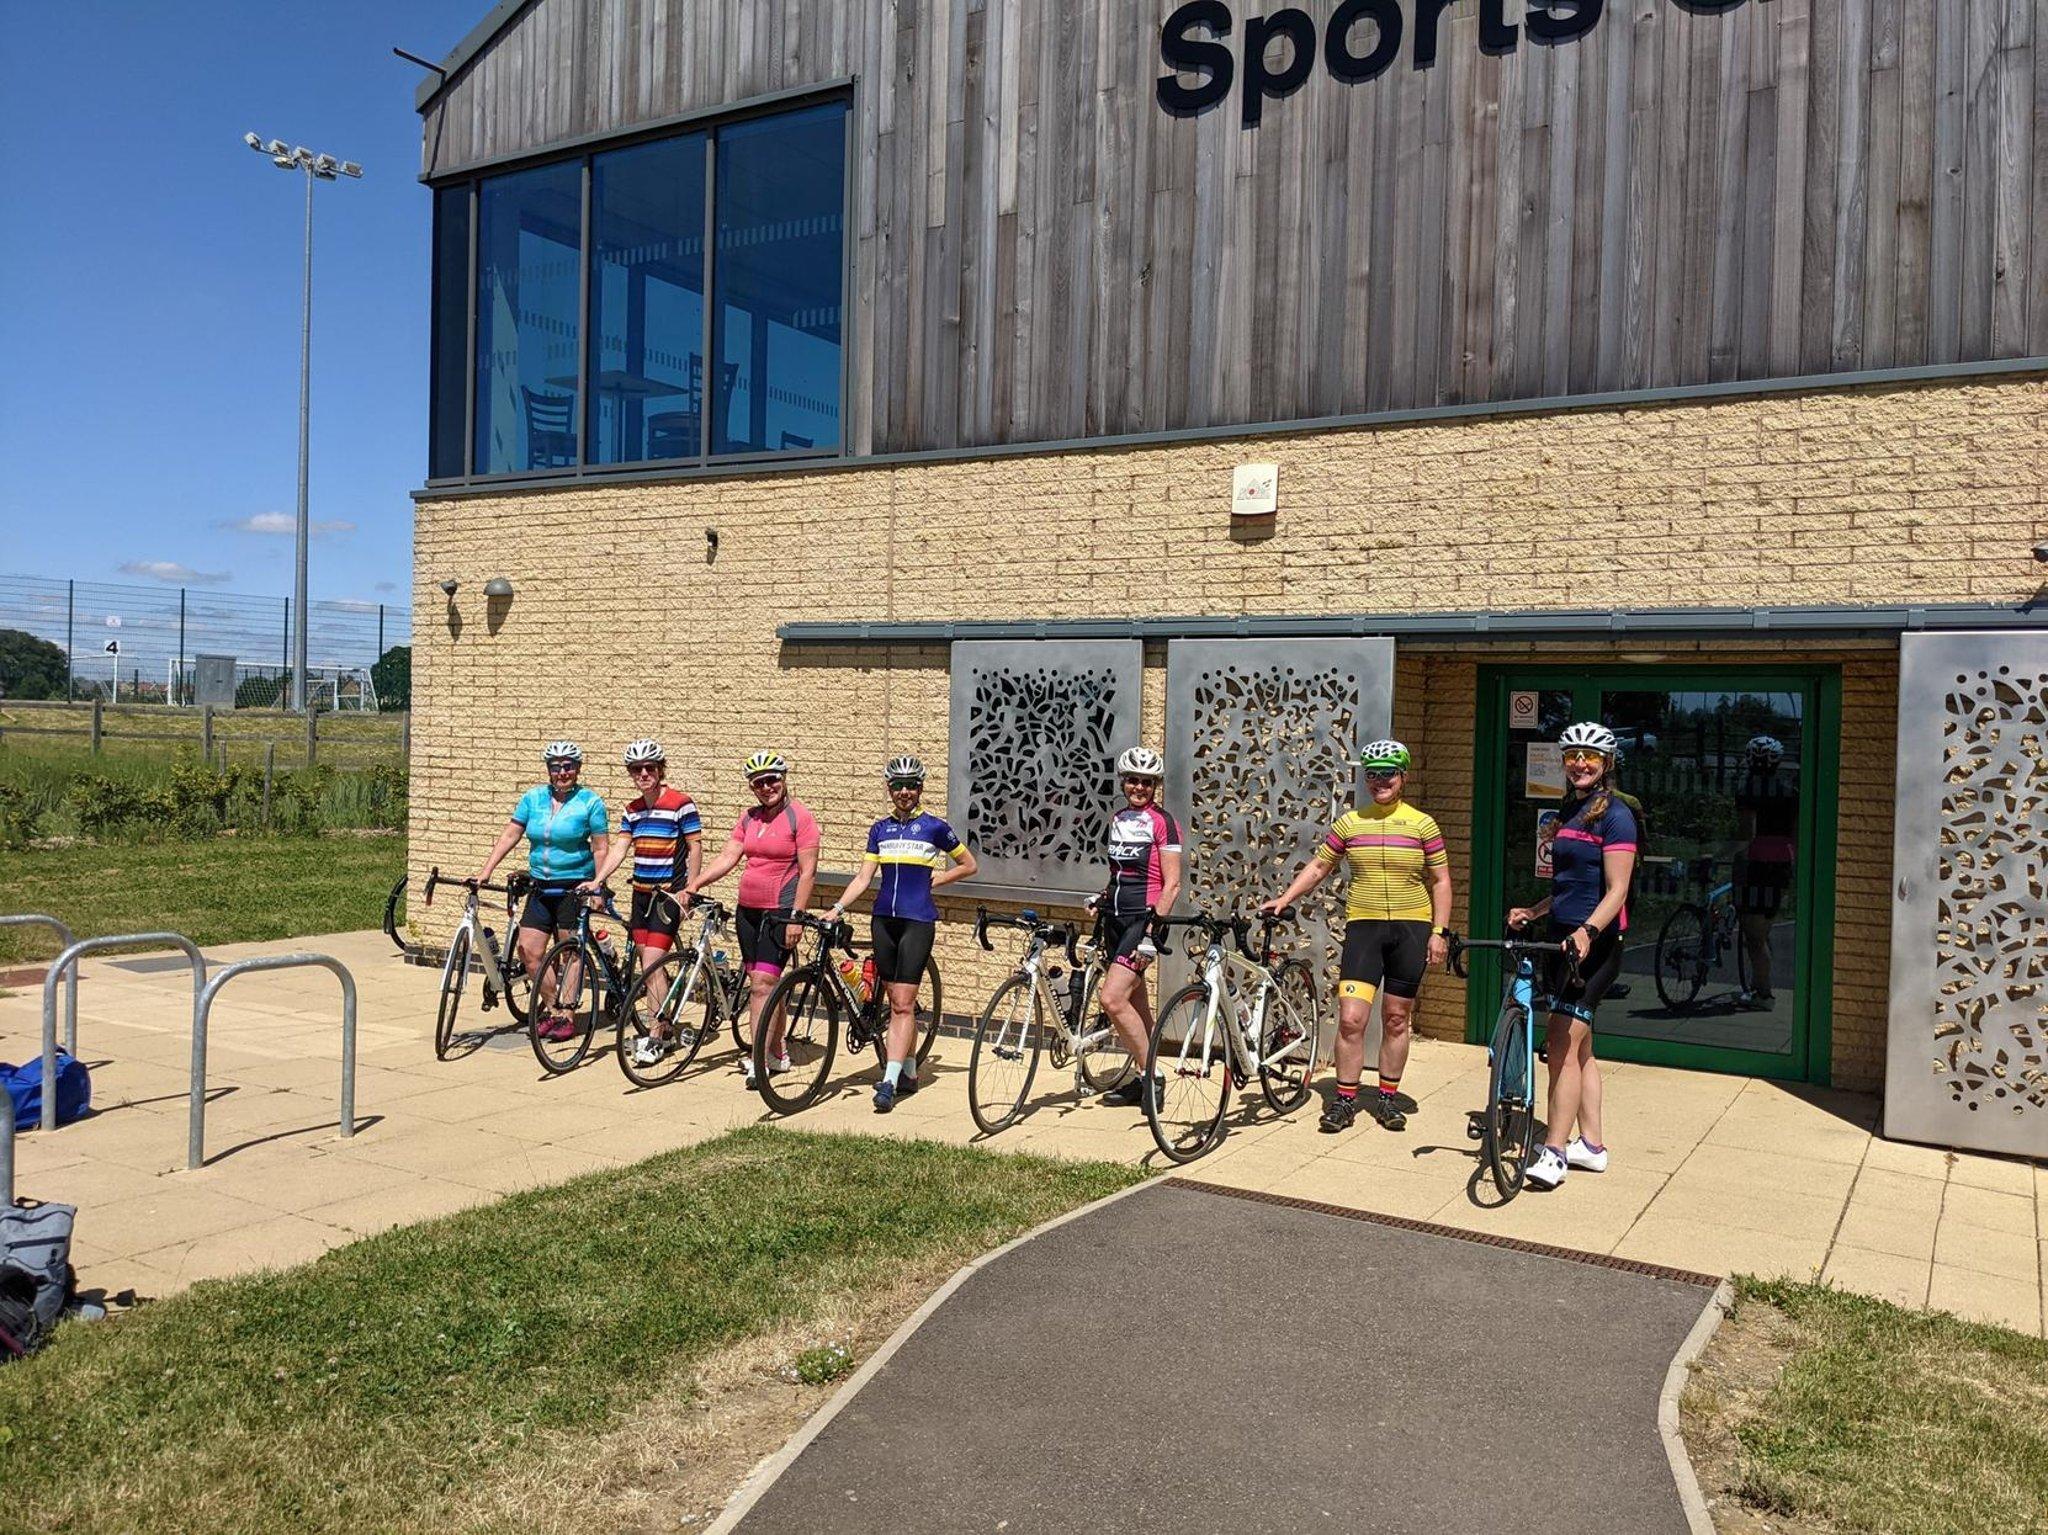 New biking partnership goals to assist promote biking throughout Banbury space